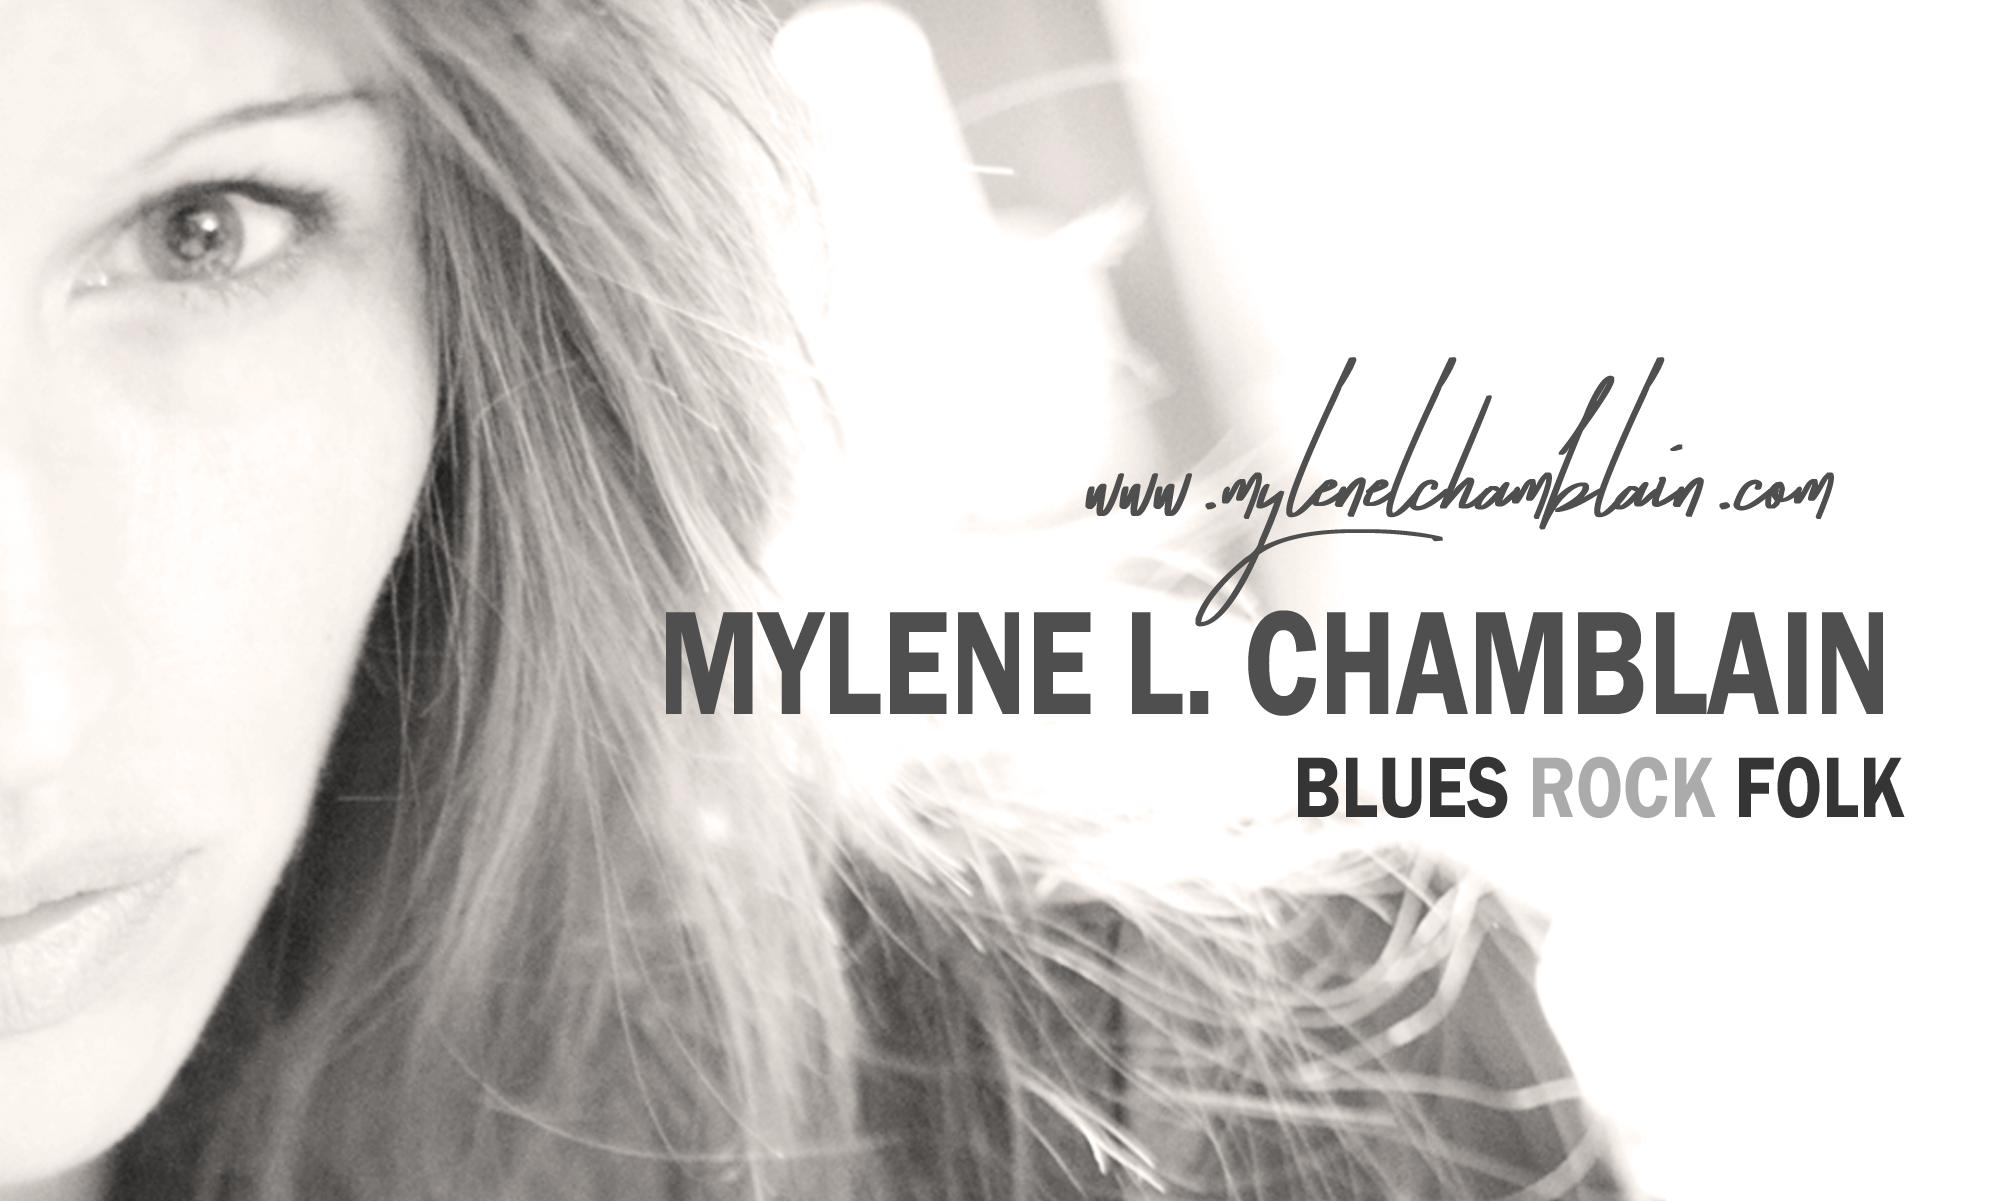 Mylène L. Chamblain